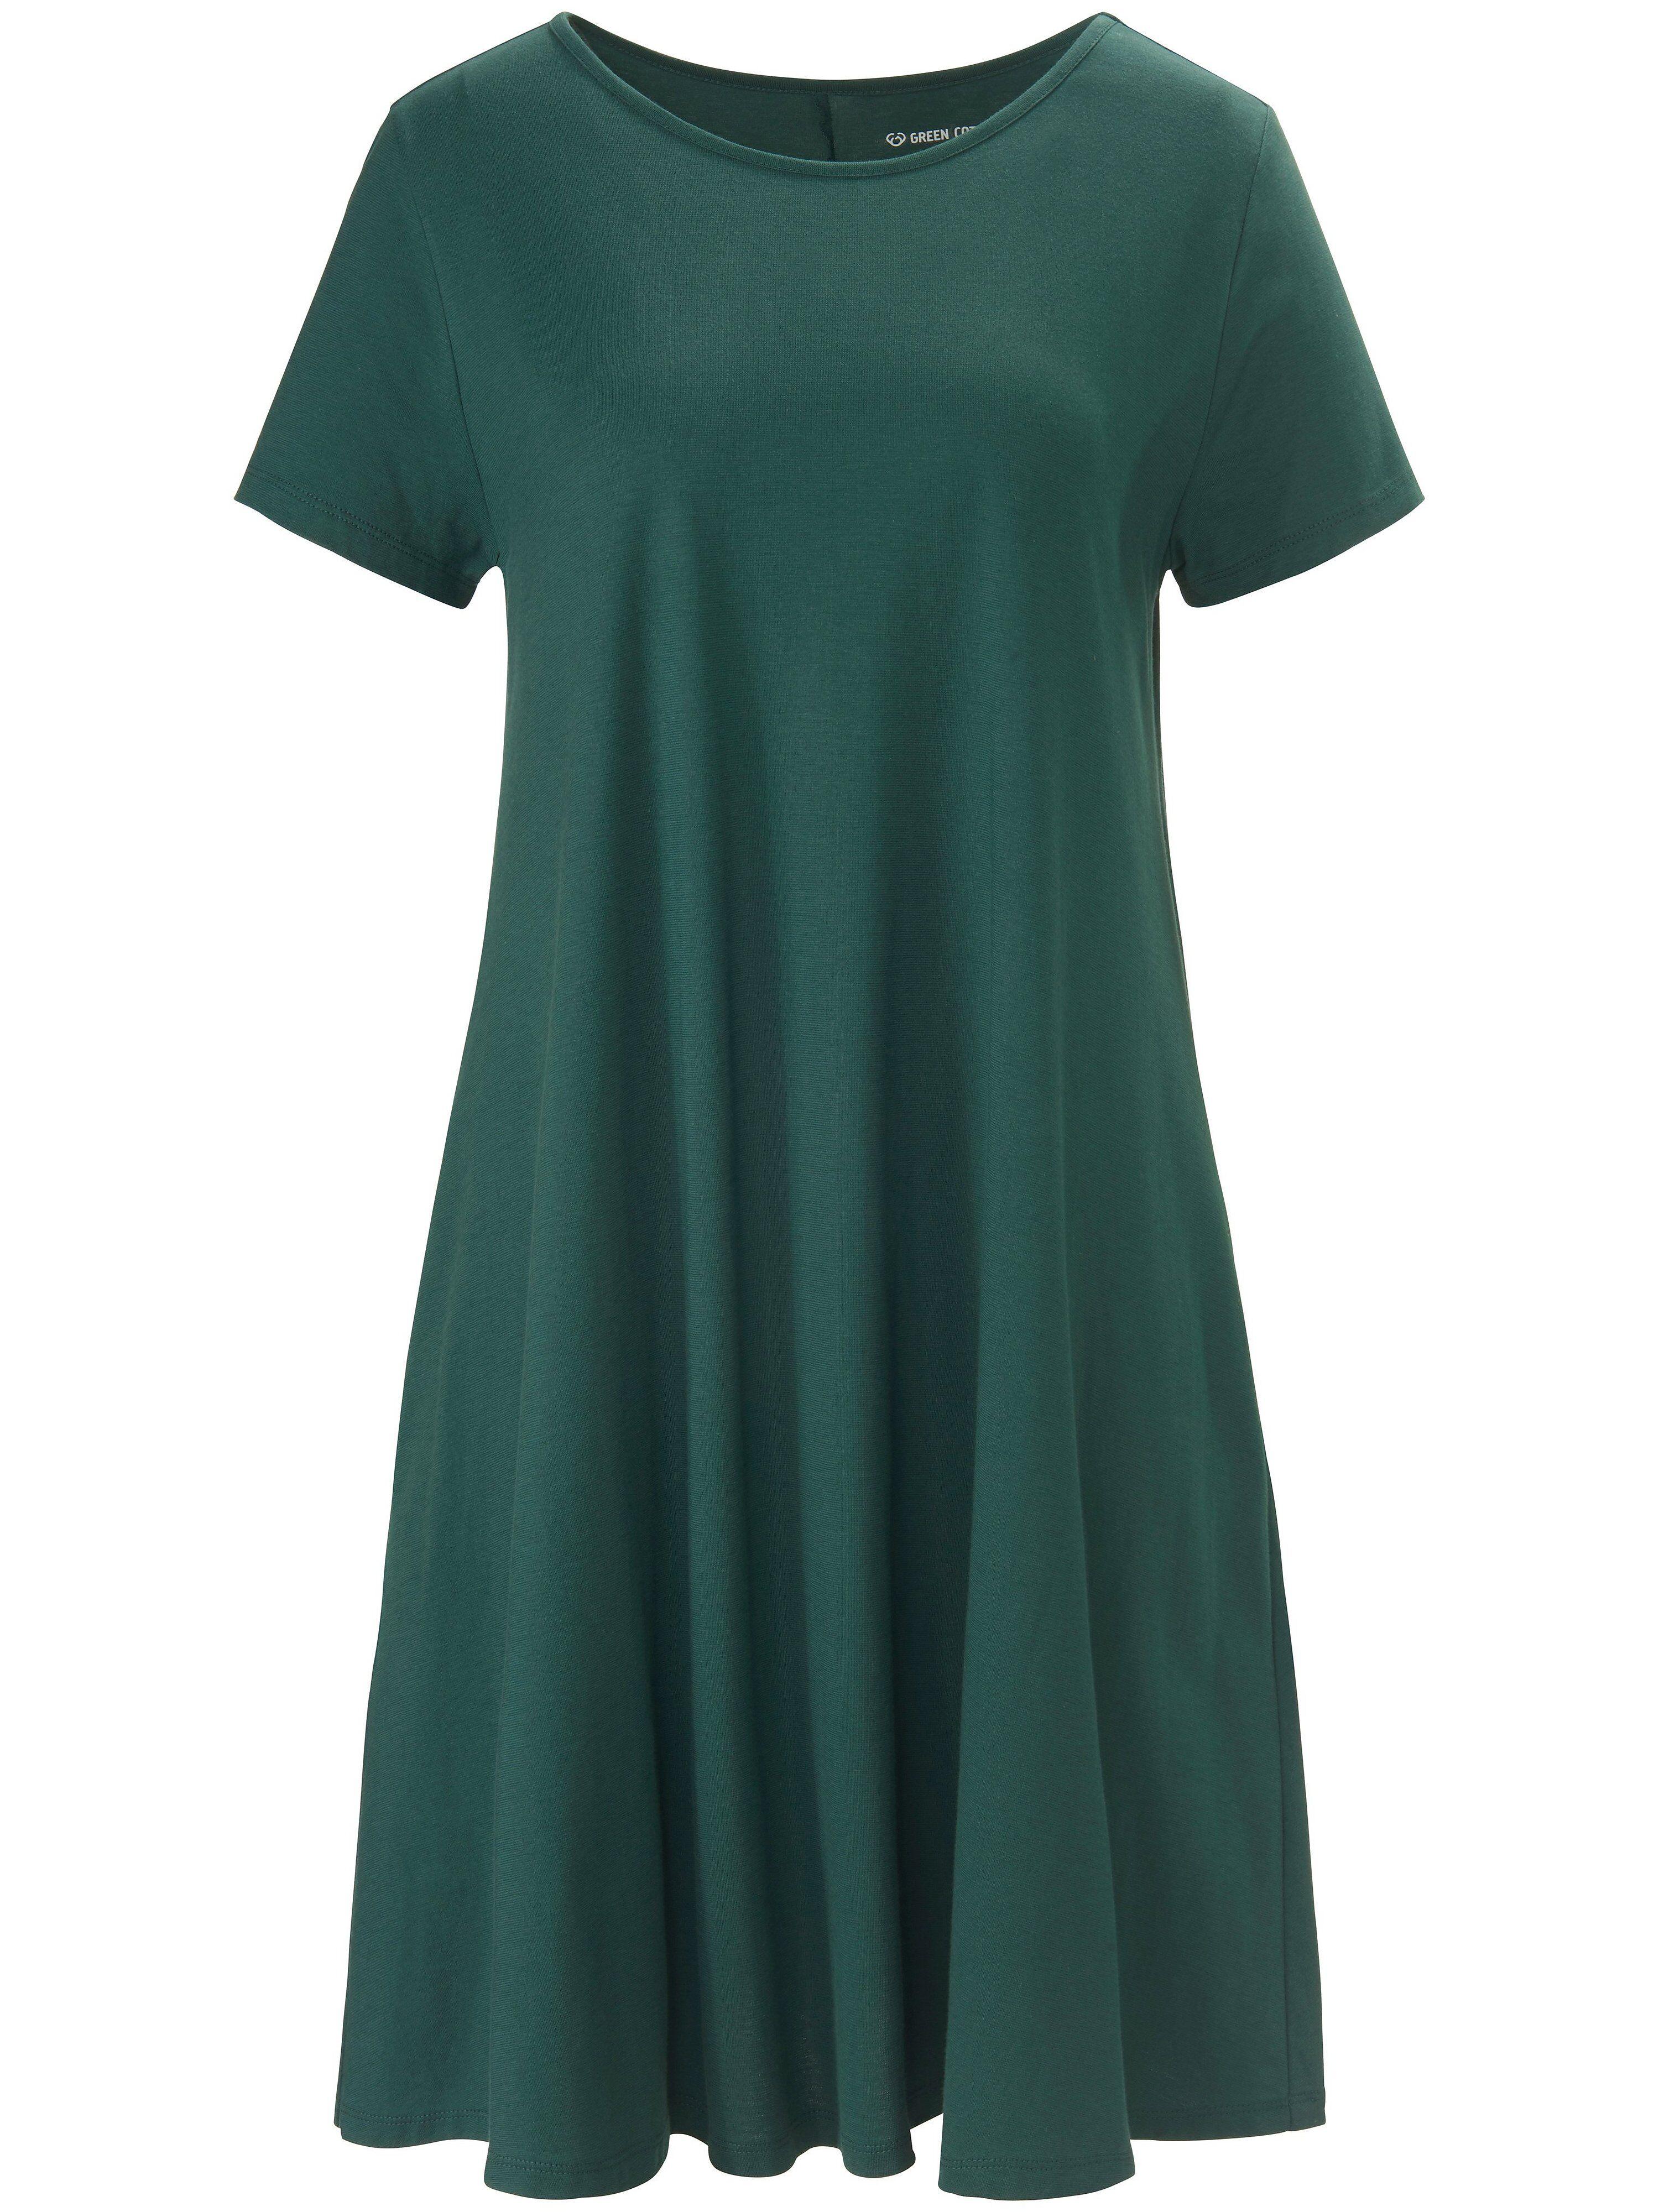 Green Cotton La robe en jersey 100% coton  Green Cotton vert  - Femme - 38